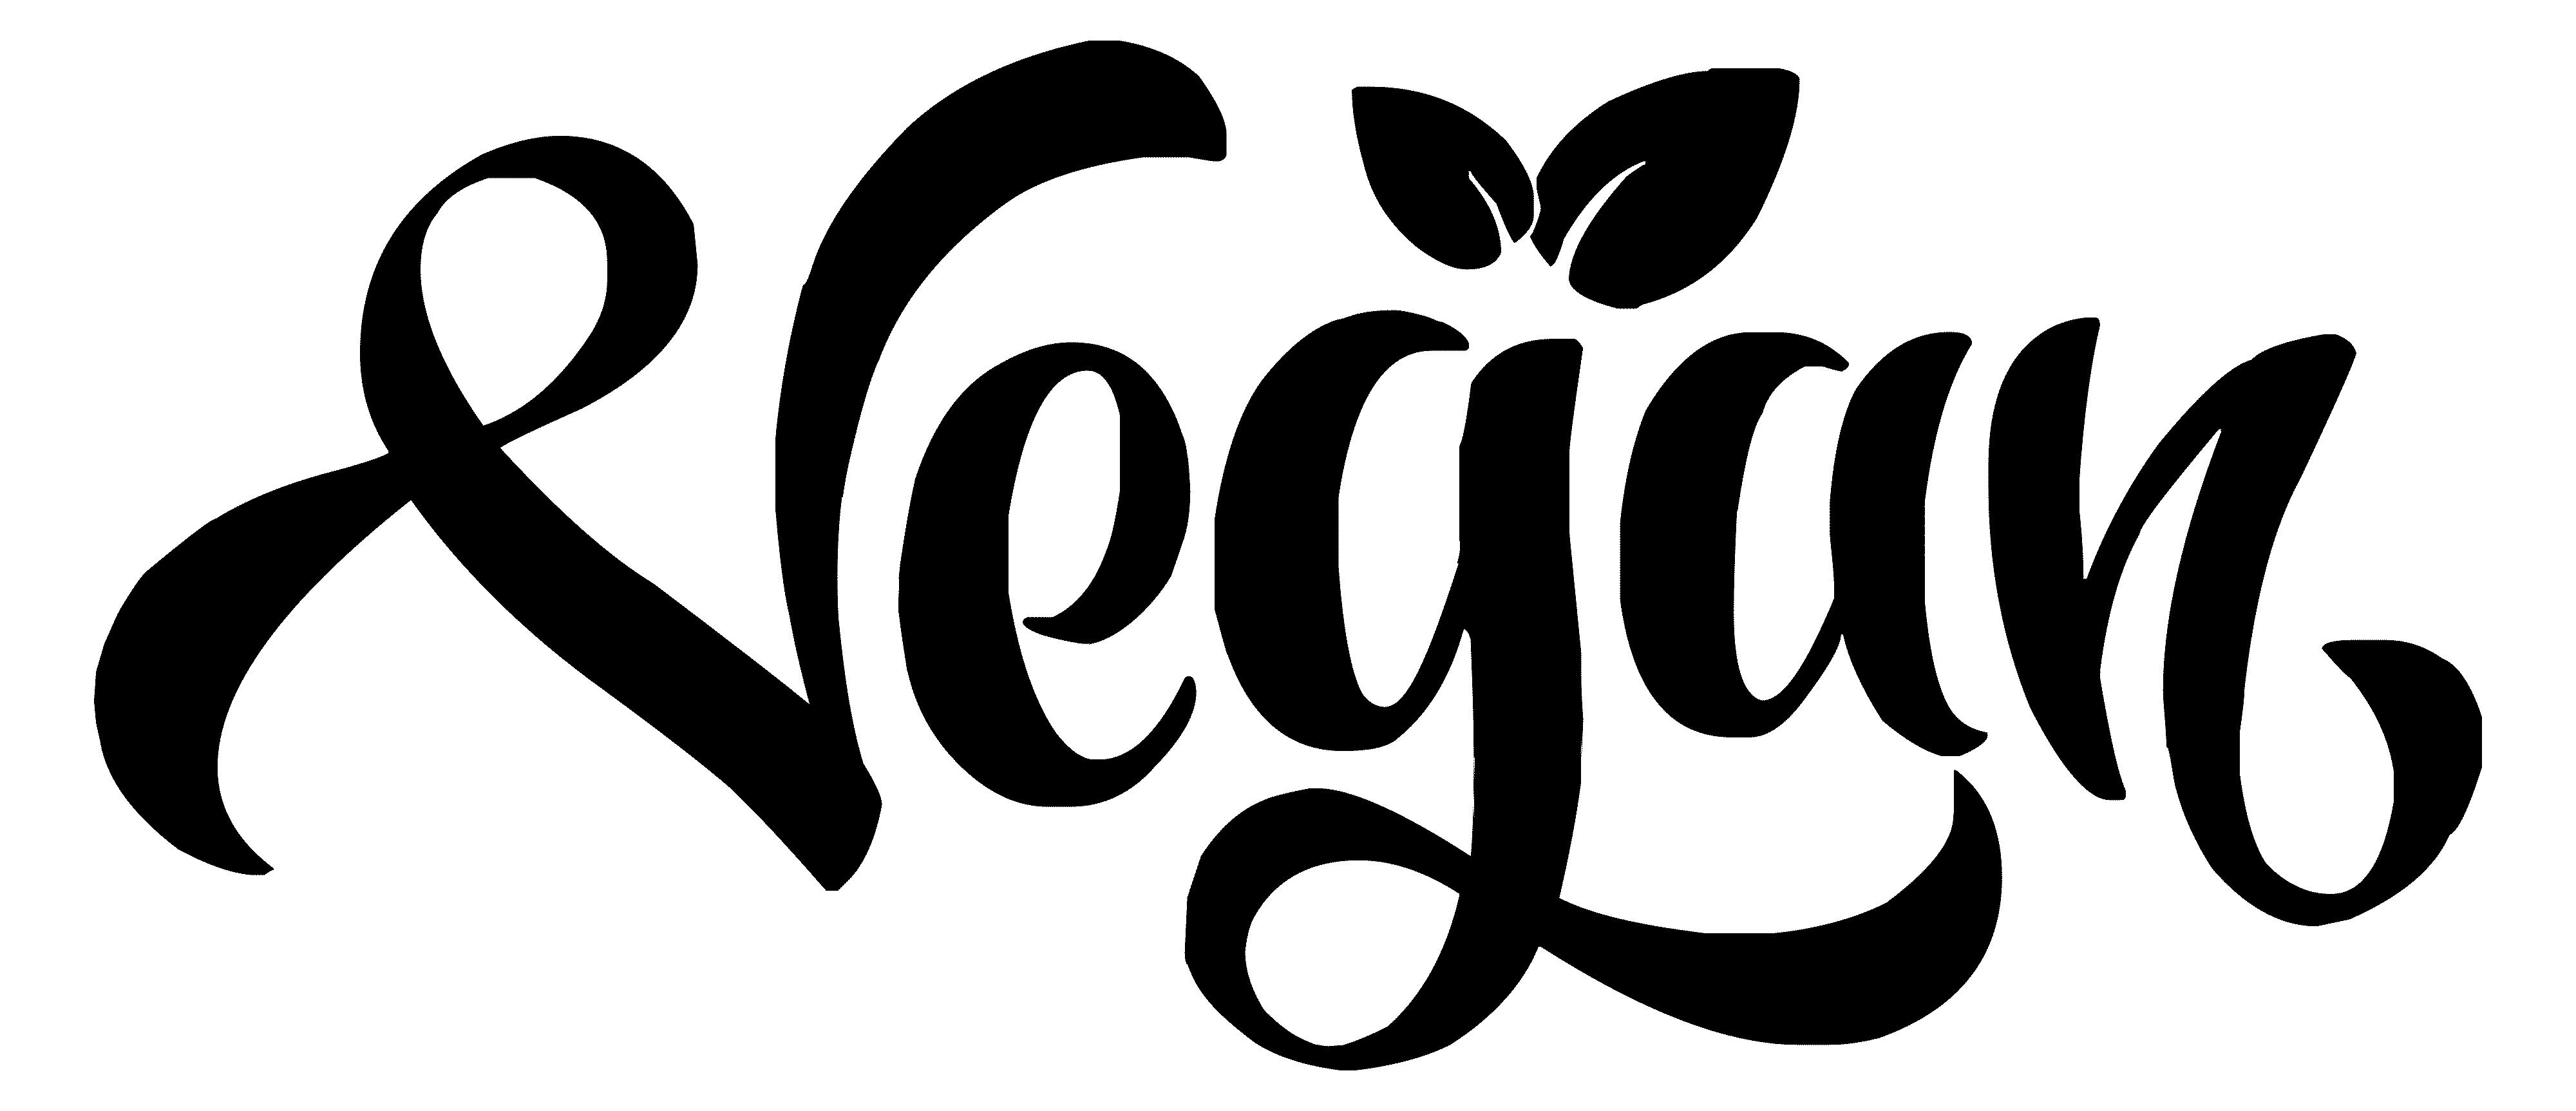 vegan symbol emojis copyright free clipart copypaste transparent png image file 4000x1725 transparent png biocorpaavc Images